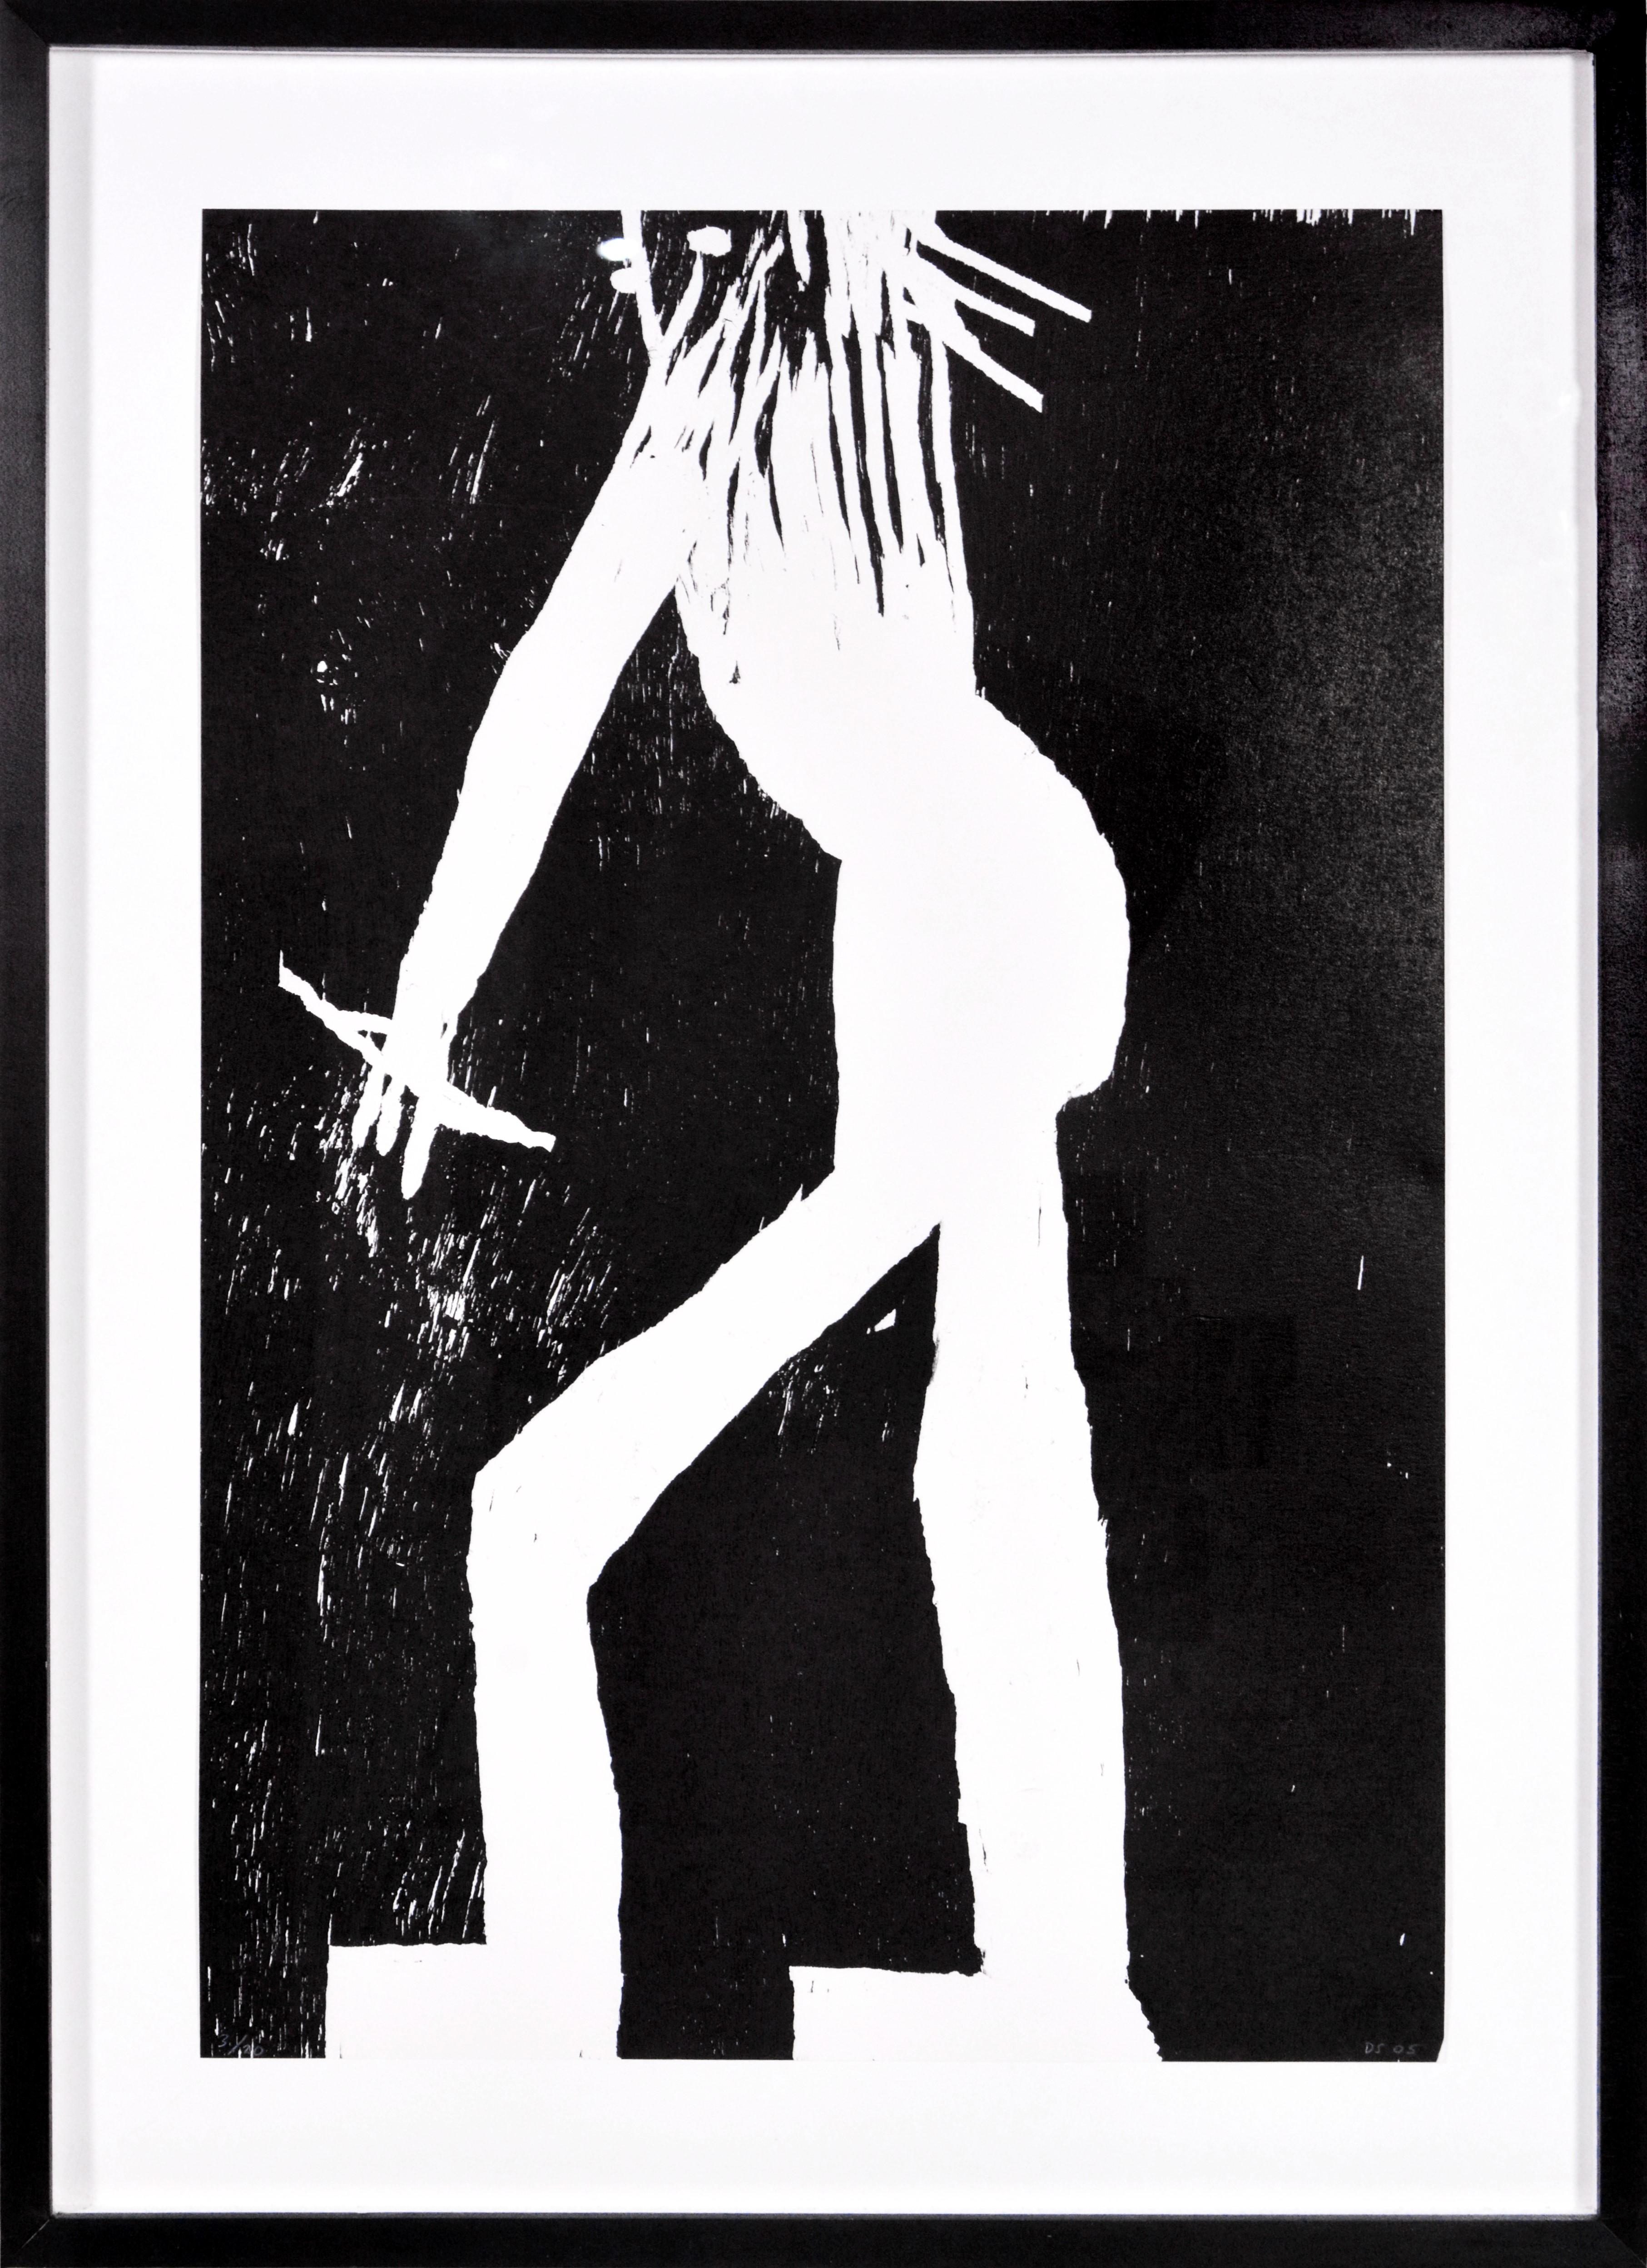 David Shrigley, Man, Woodcut, 2005